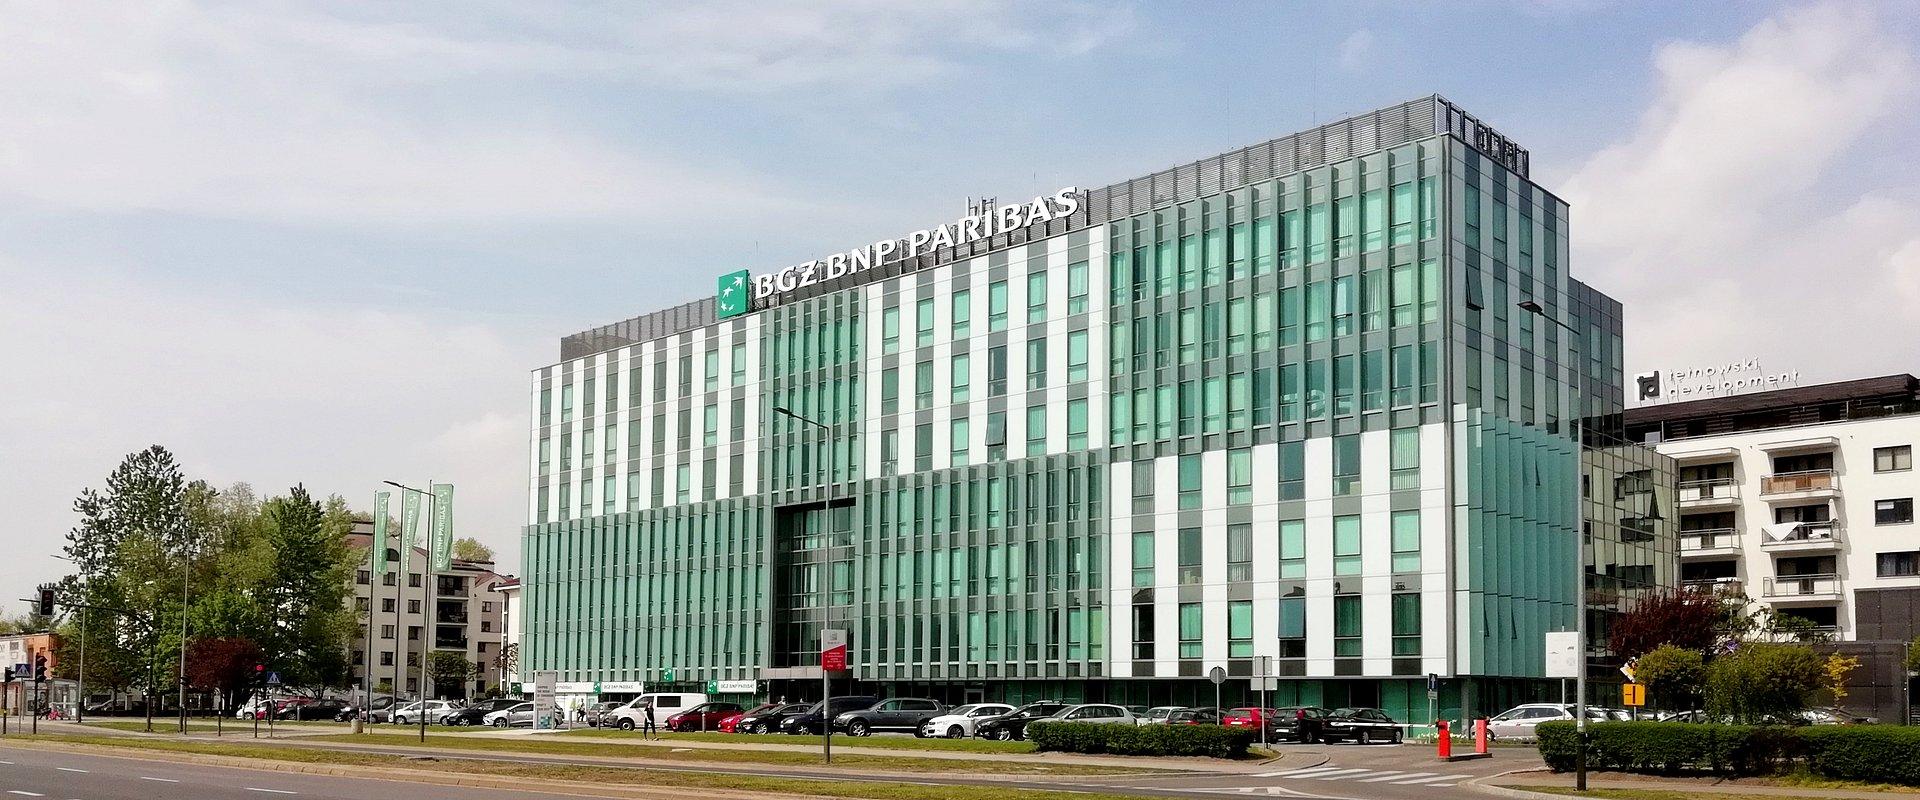 Avatar returns onto Kraków's market